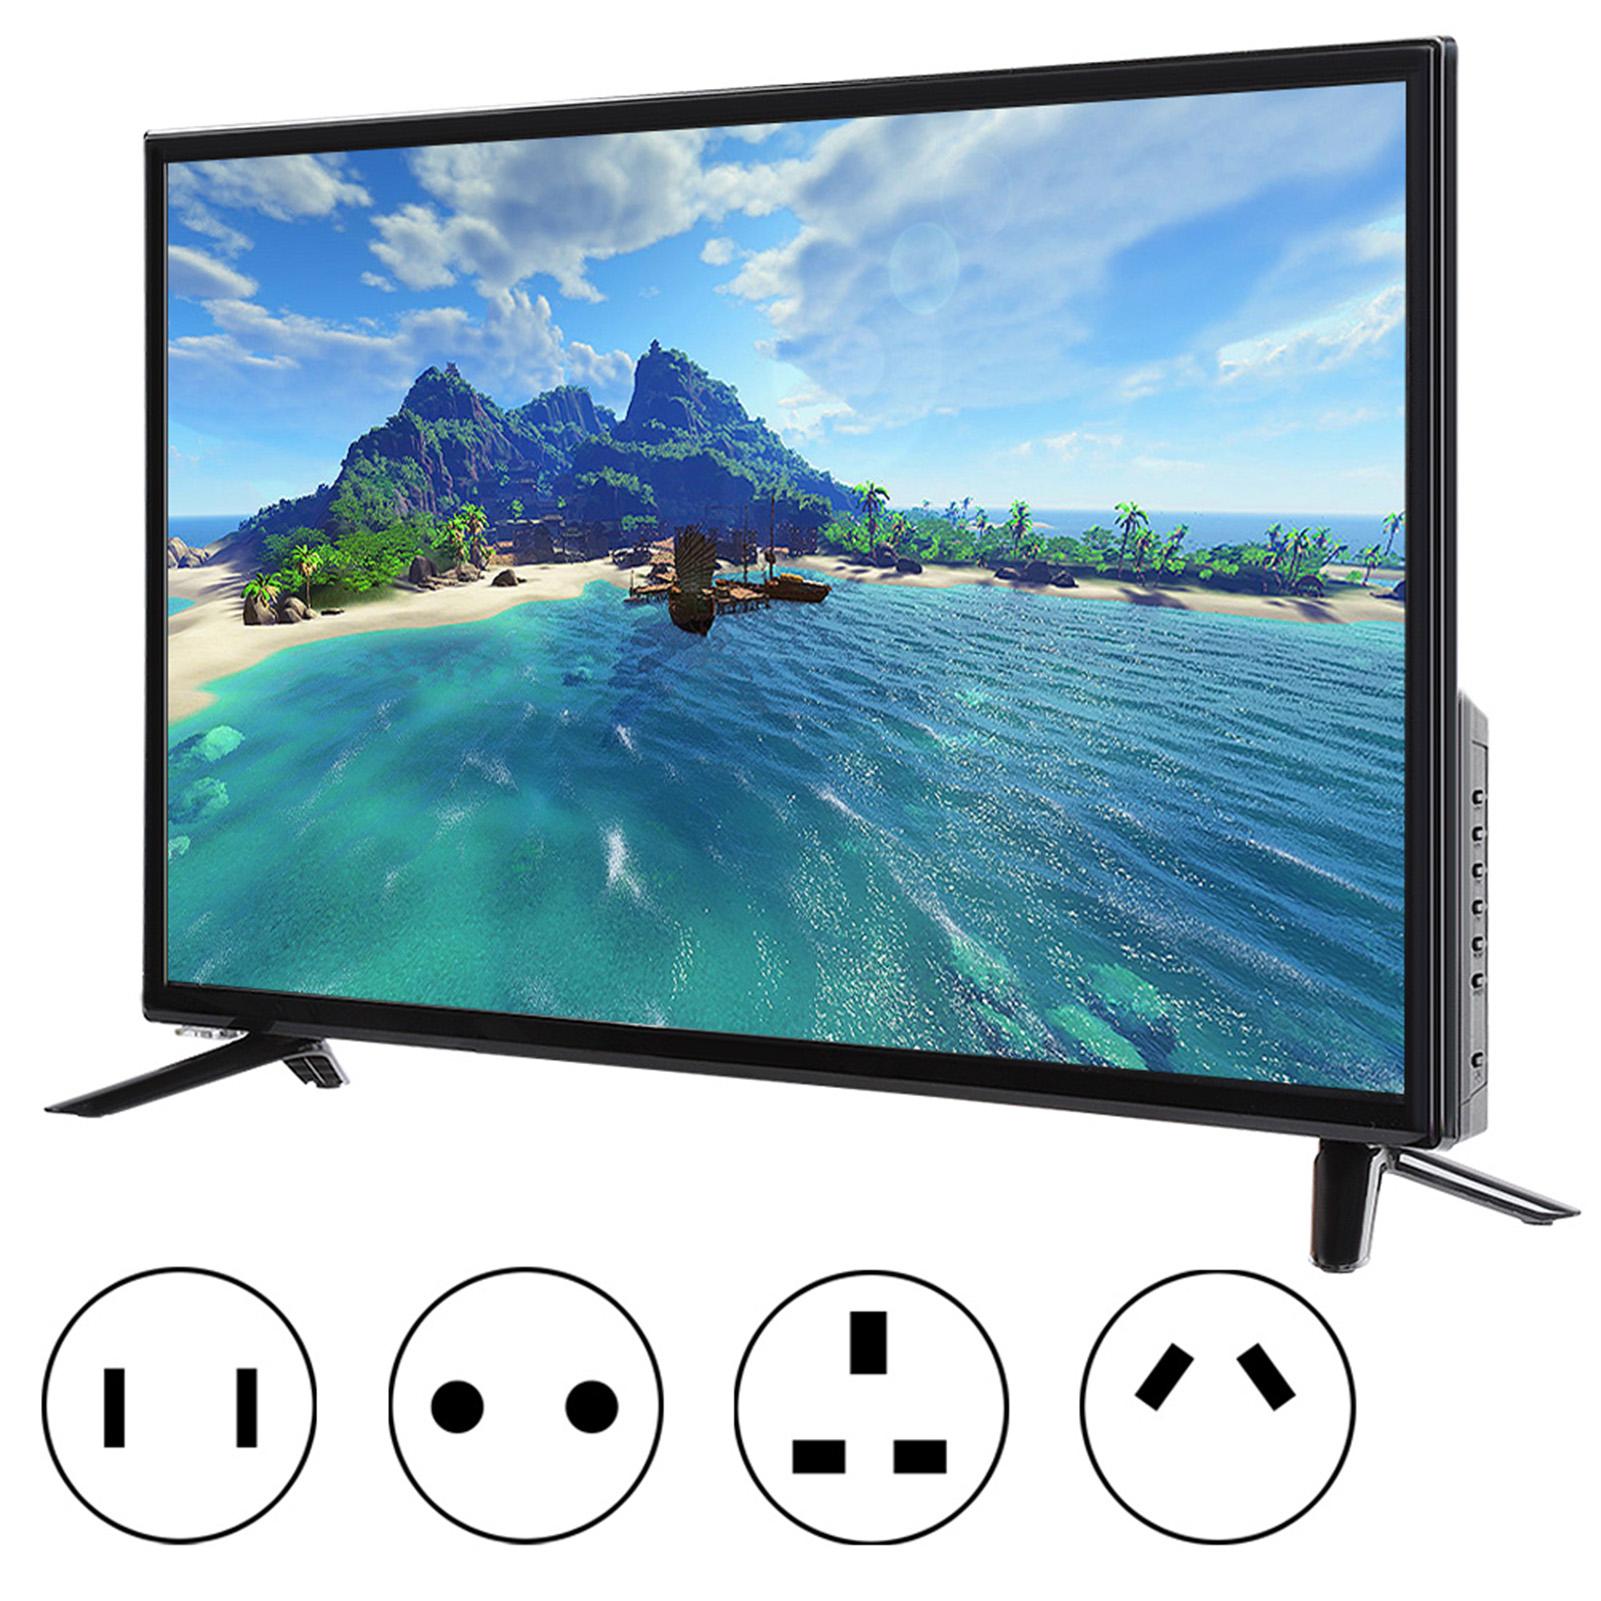 43inch-4K-WiFi-Network-HD-Smart-LCD-TV-HDR-Flat-Screen-Television-HDMI-USB-60HZ miniature 44